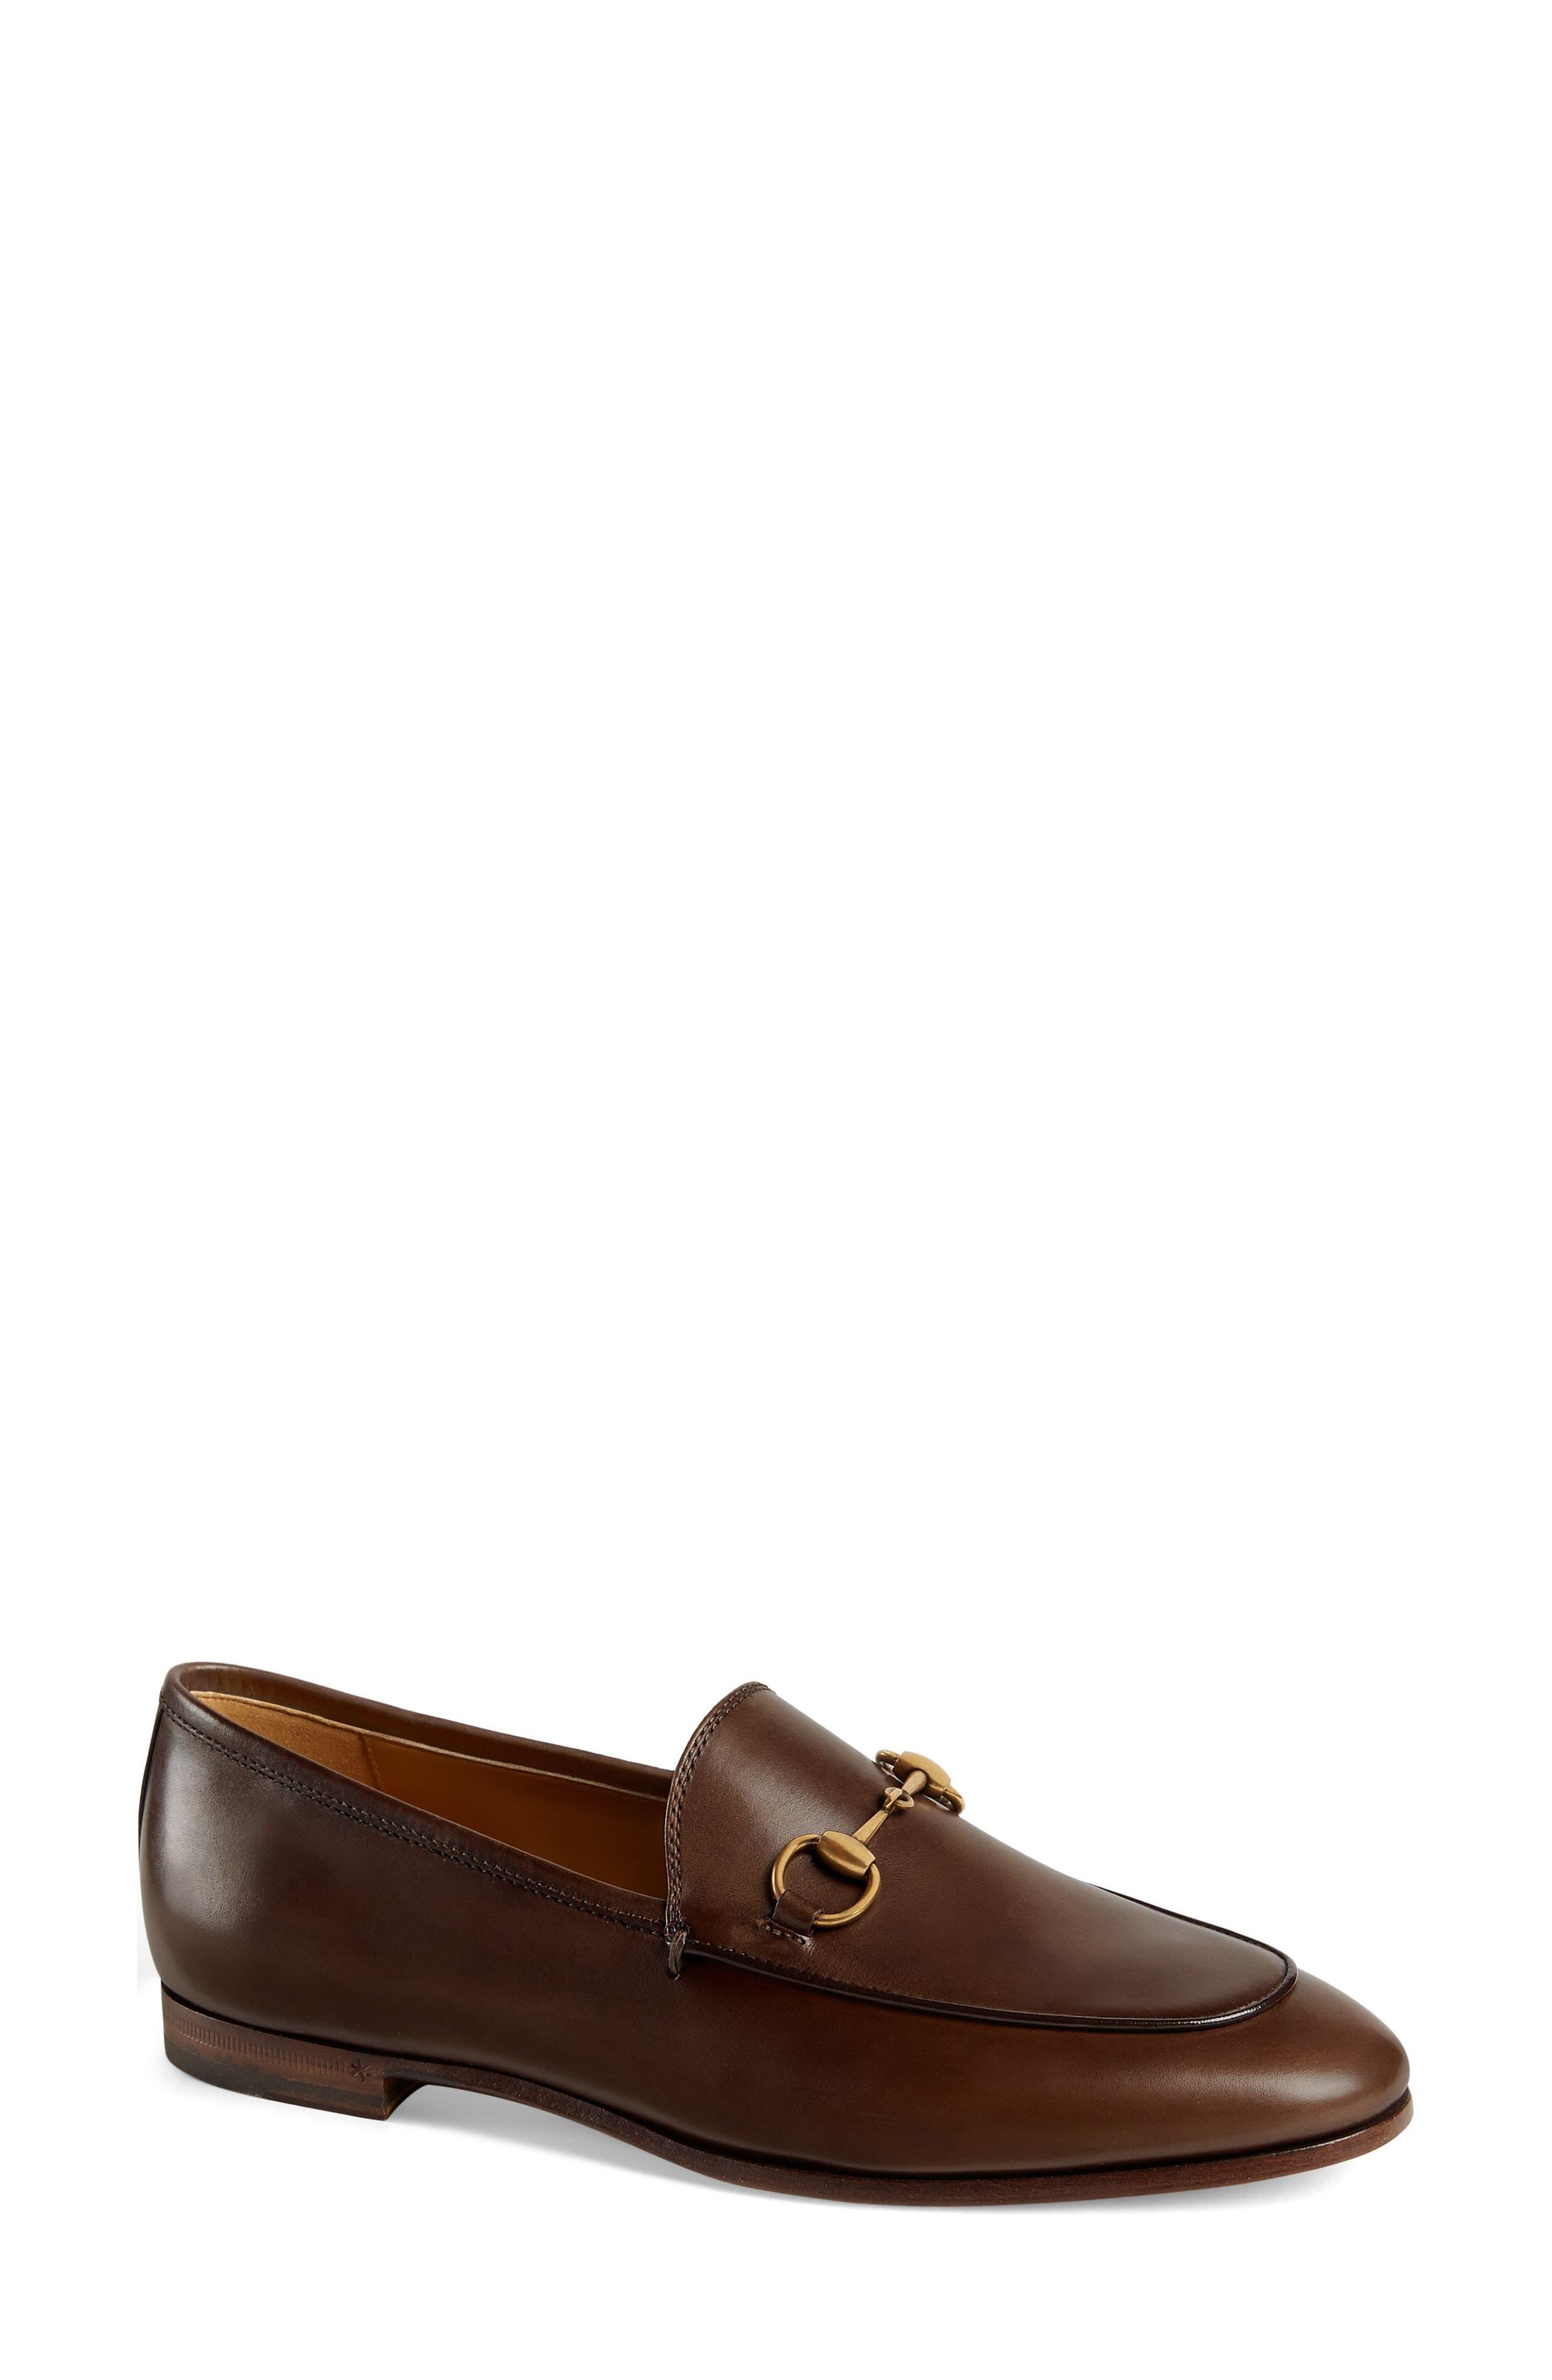 'Jordaan' Loafer,                         Main,                         color, FONDENTE BROWN